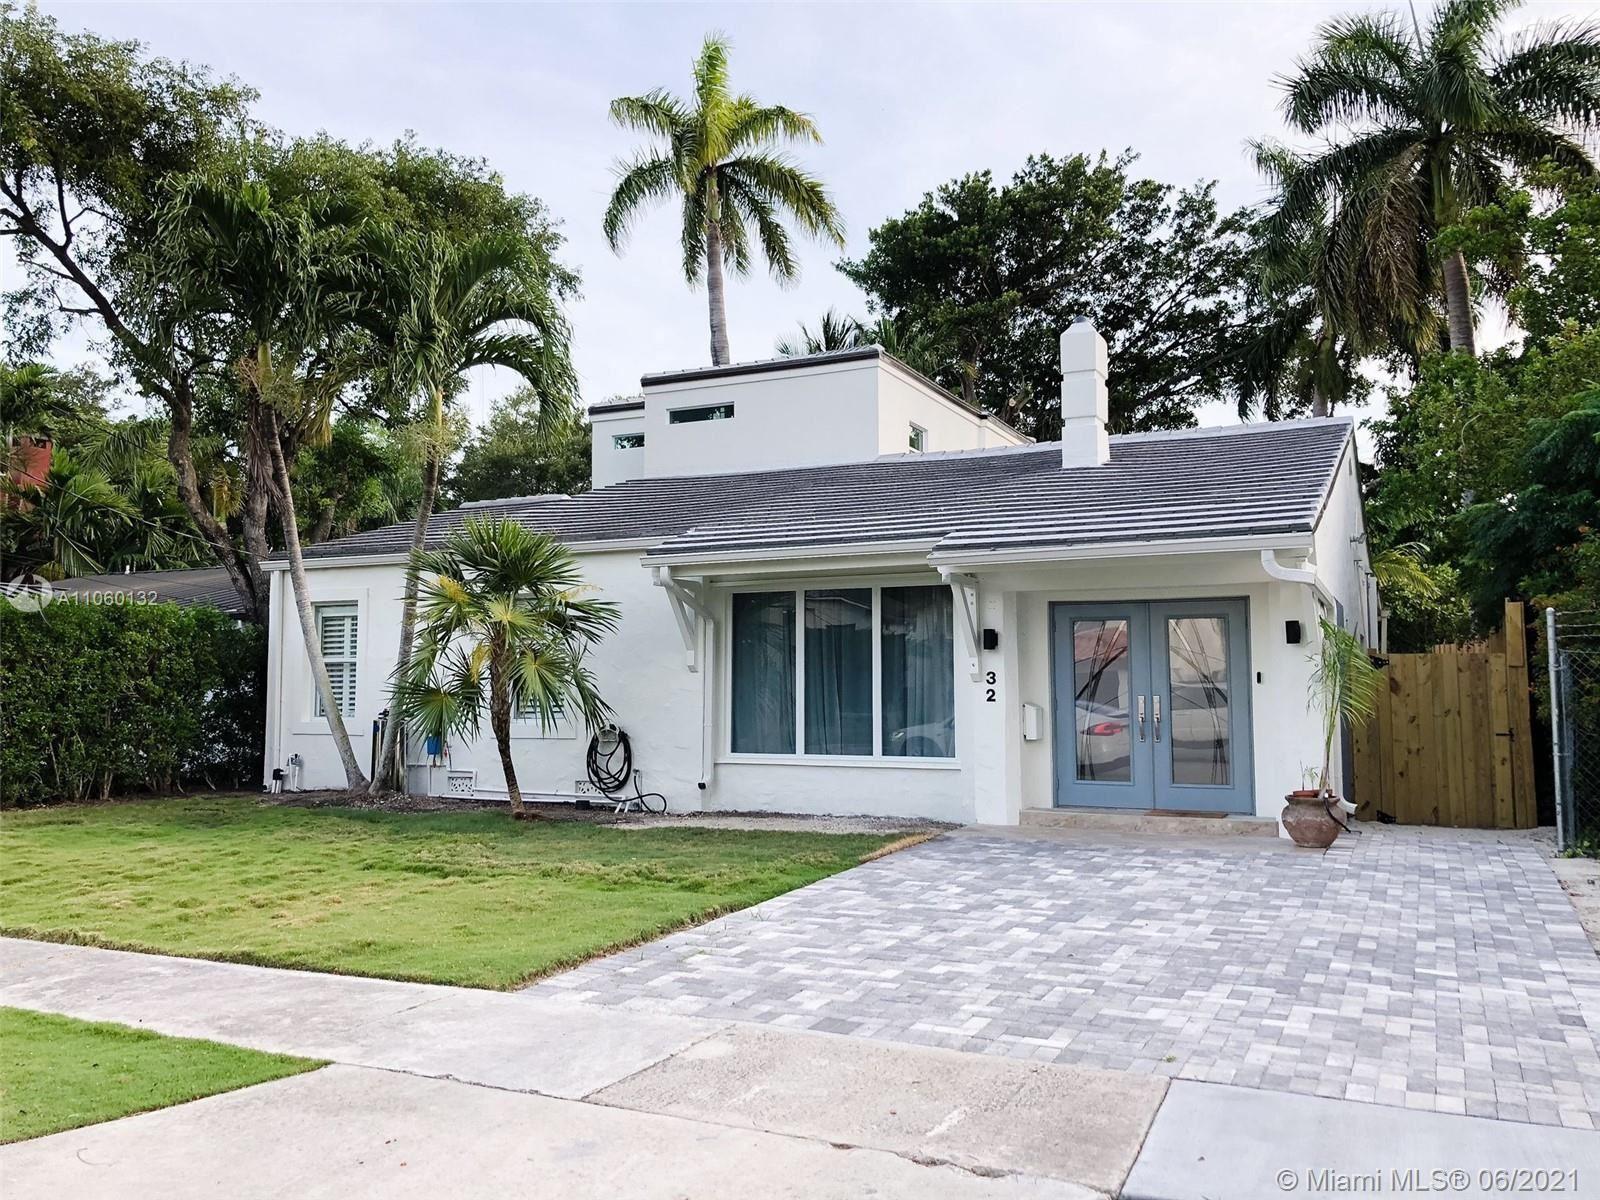 32 SW 23rd Rd, Miami, FL 33129 - #: A11060132